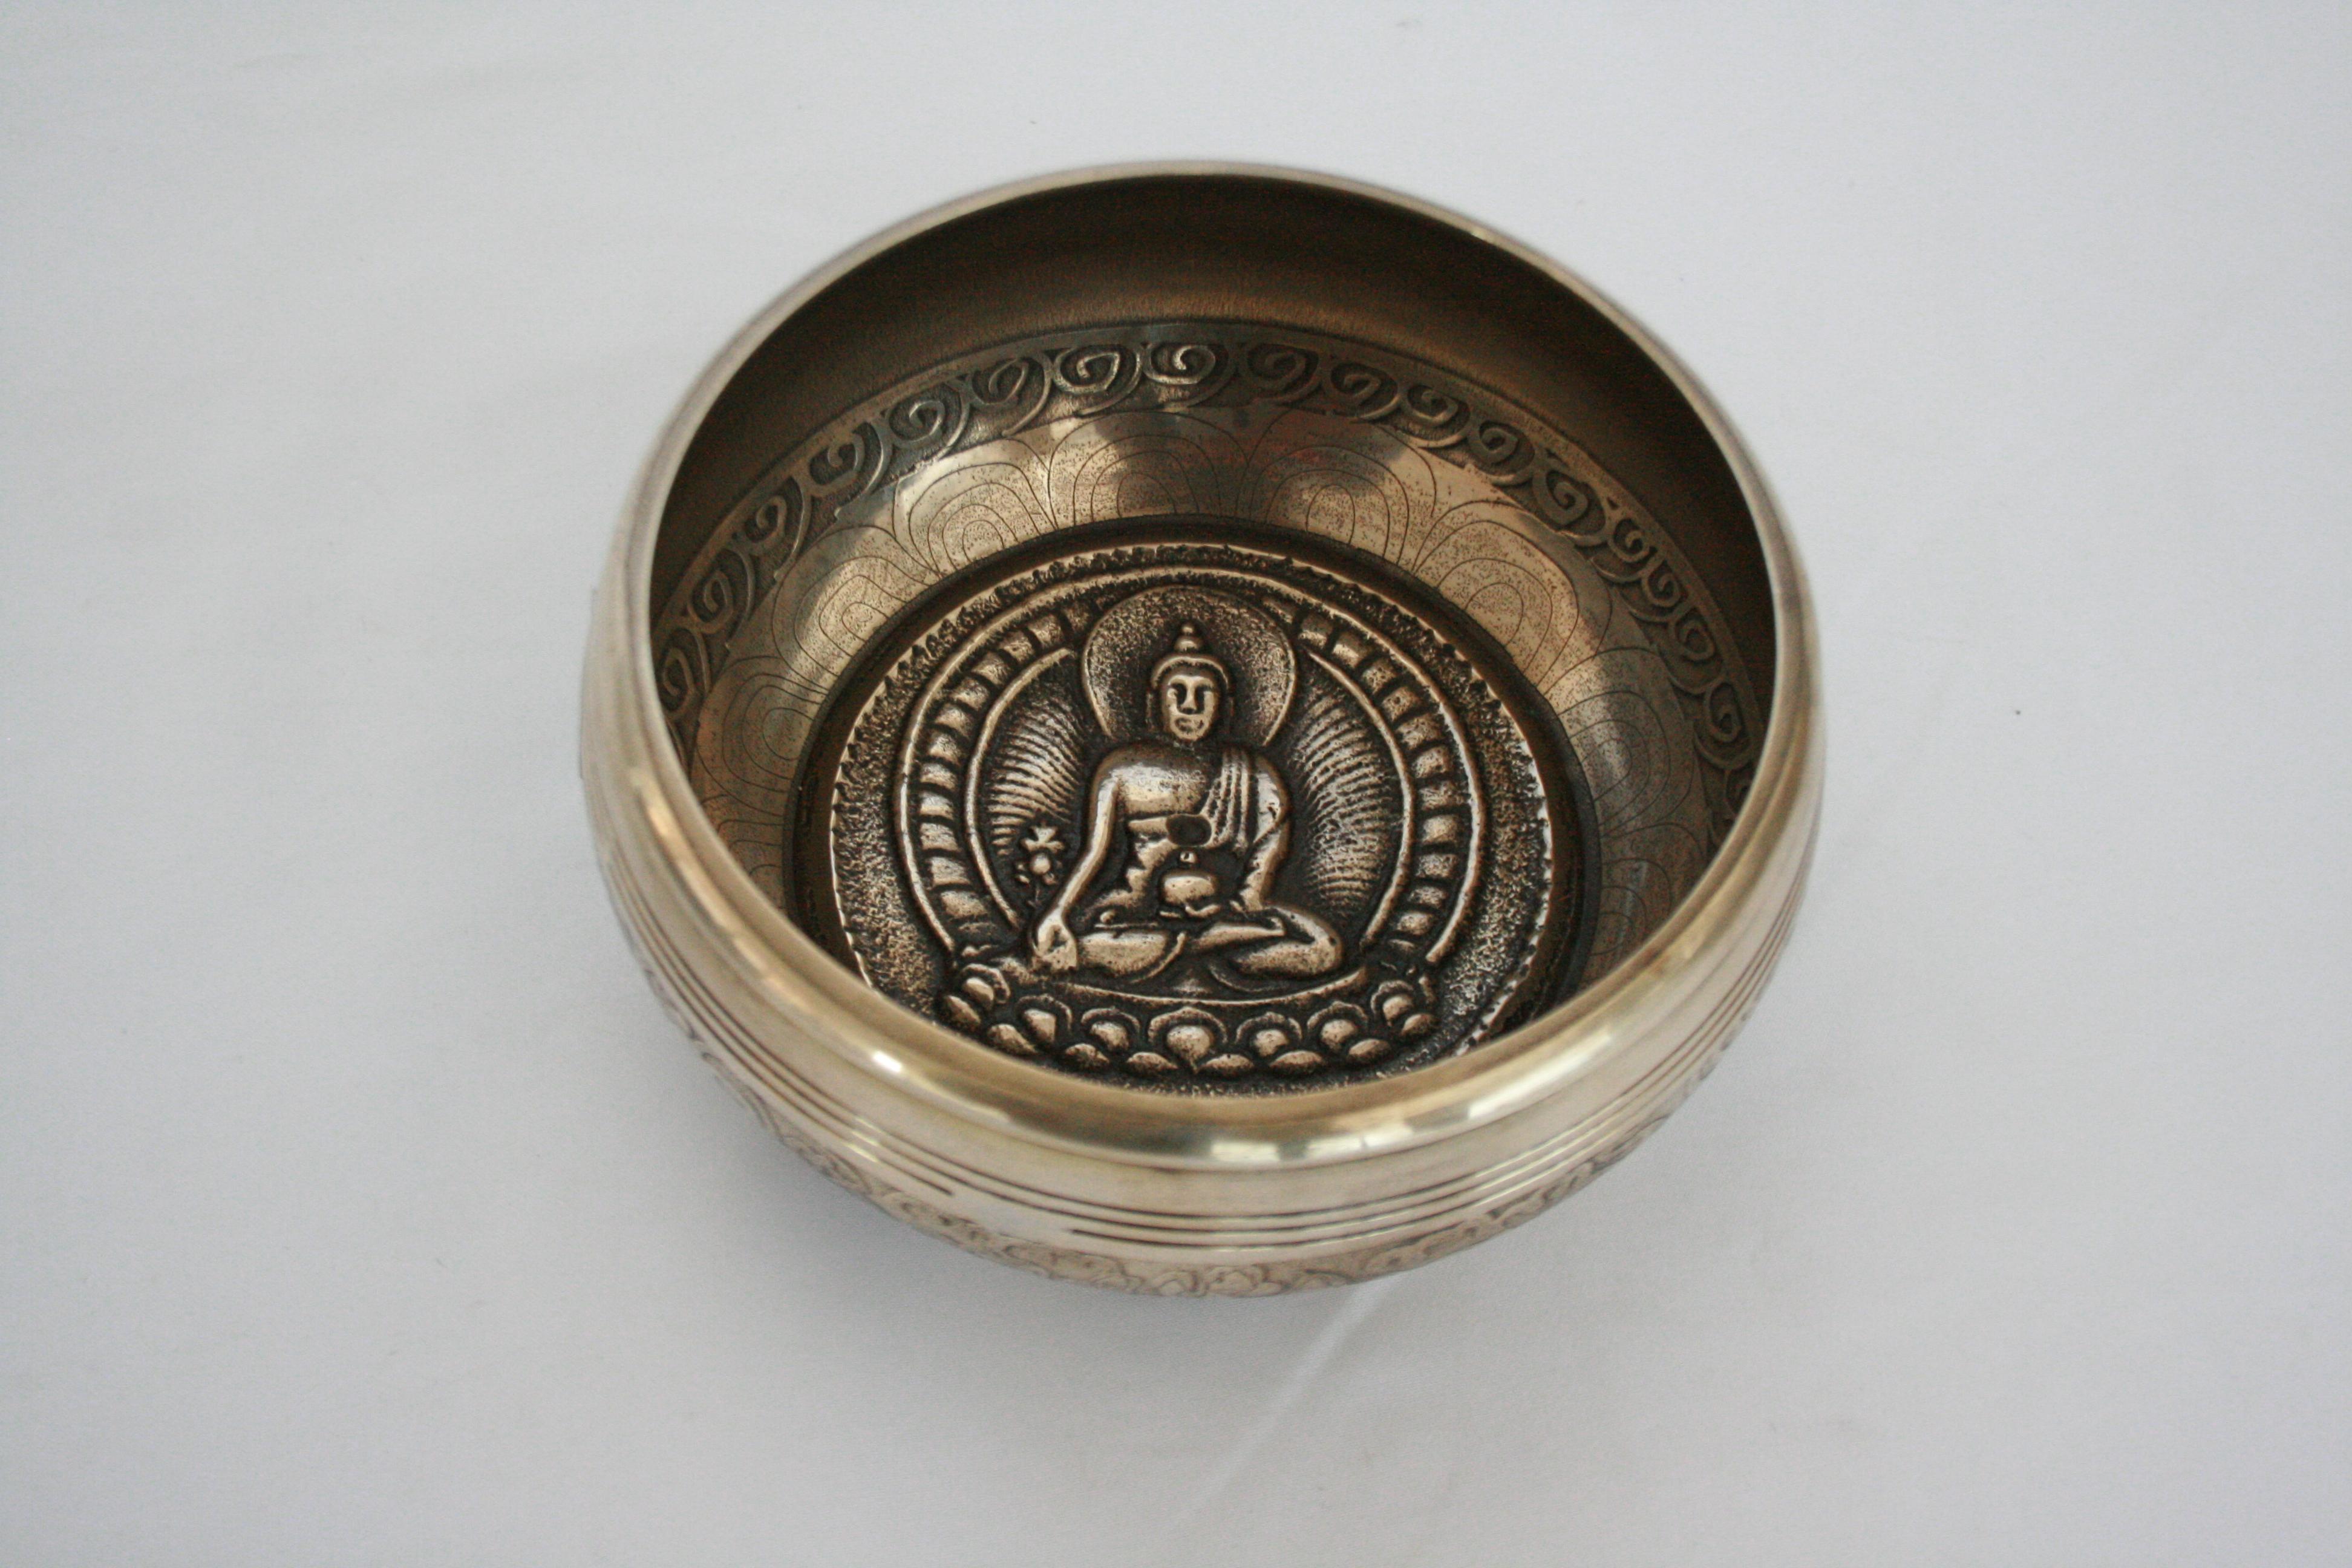 Singing bowl with etching